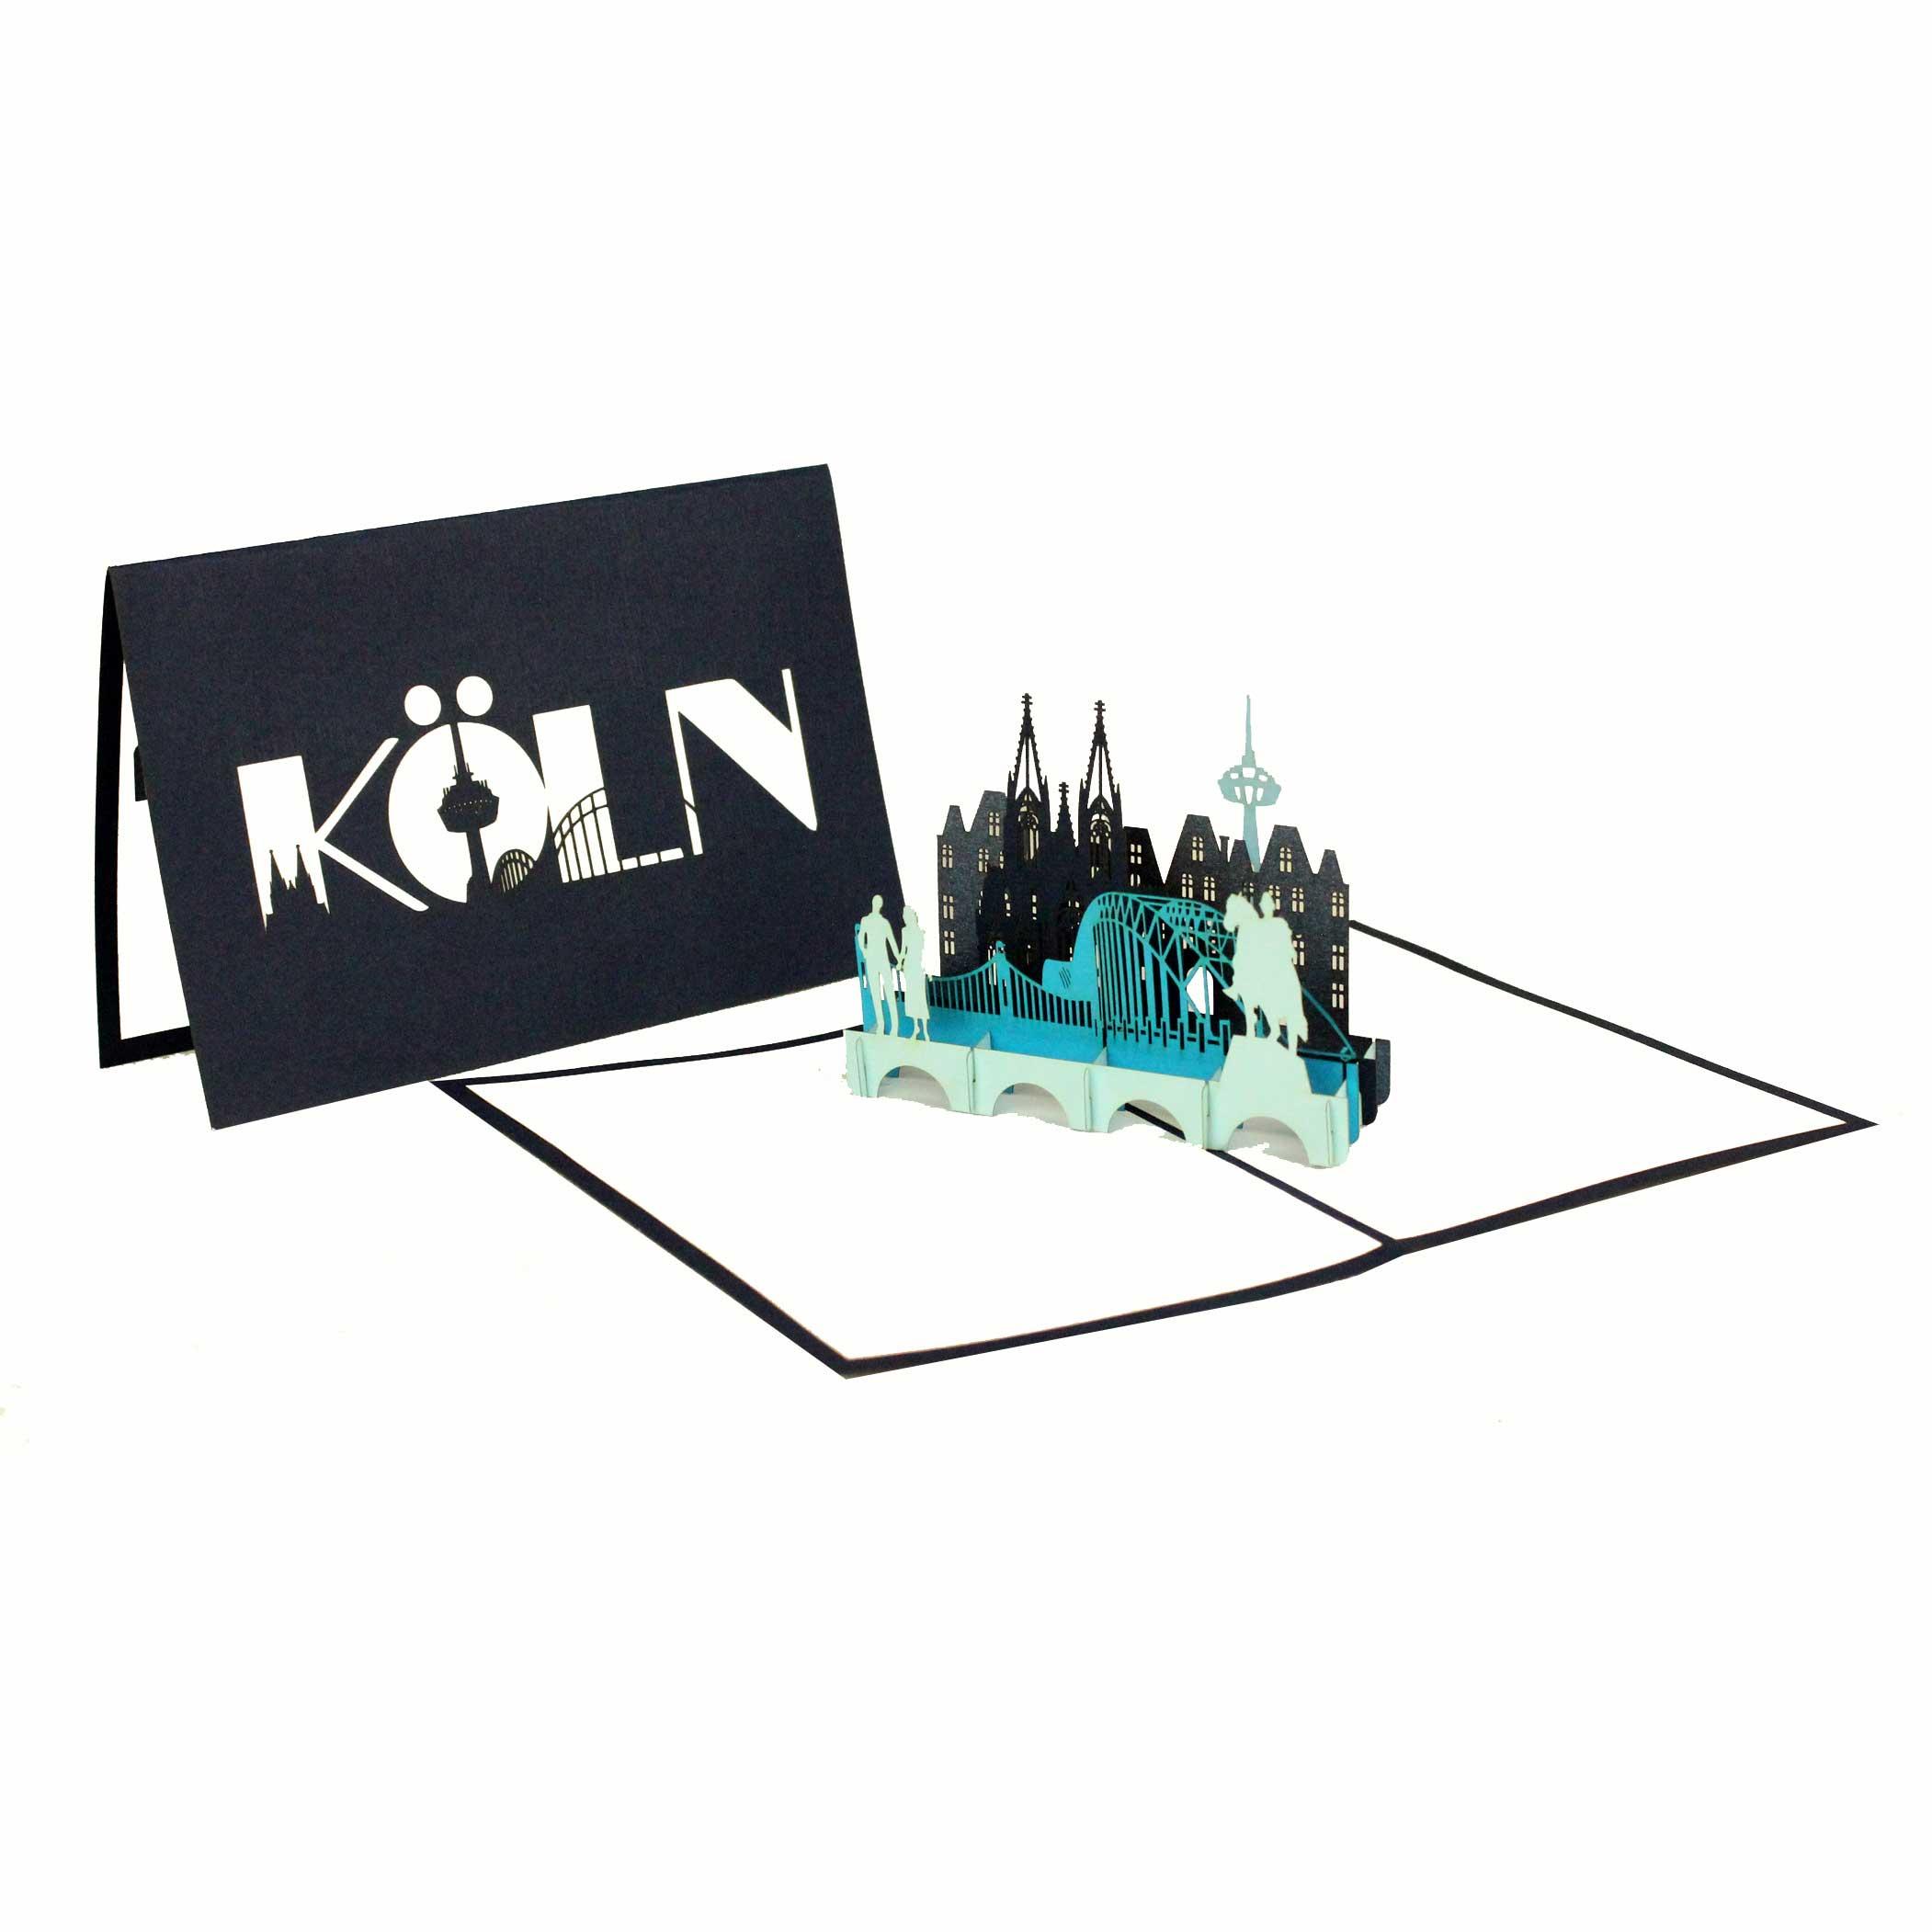 Köln Panorama - Blau